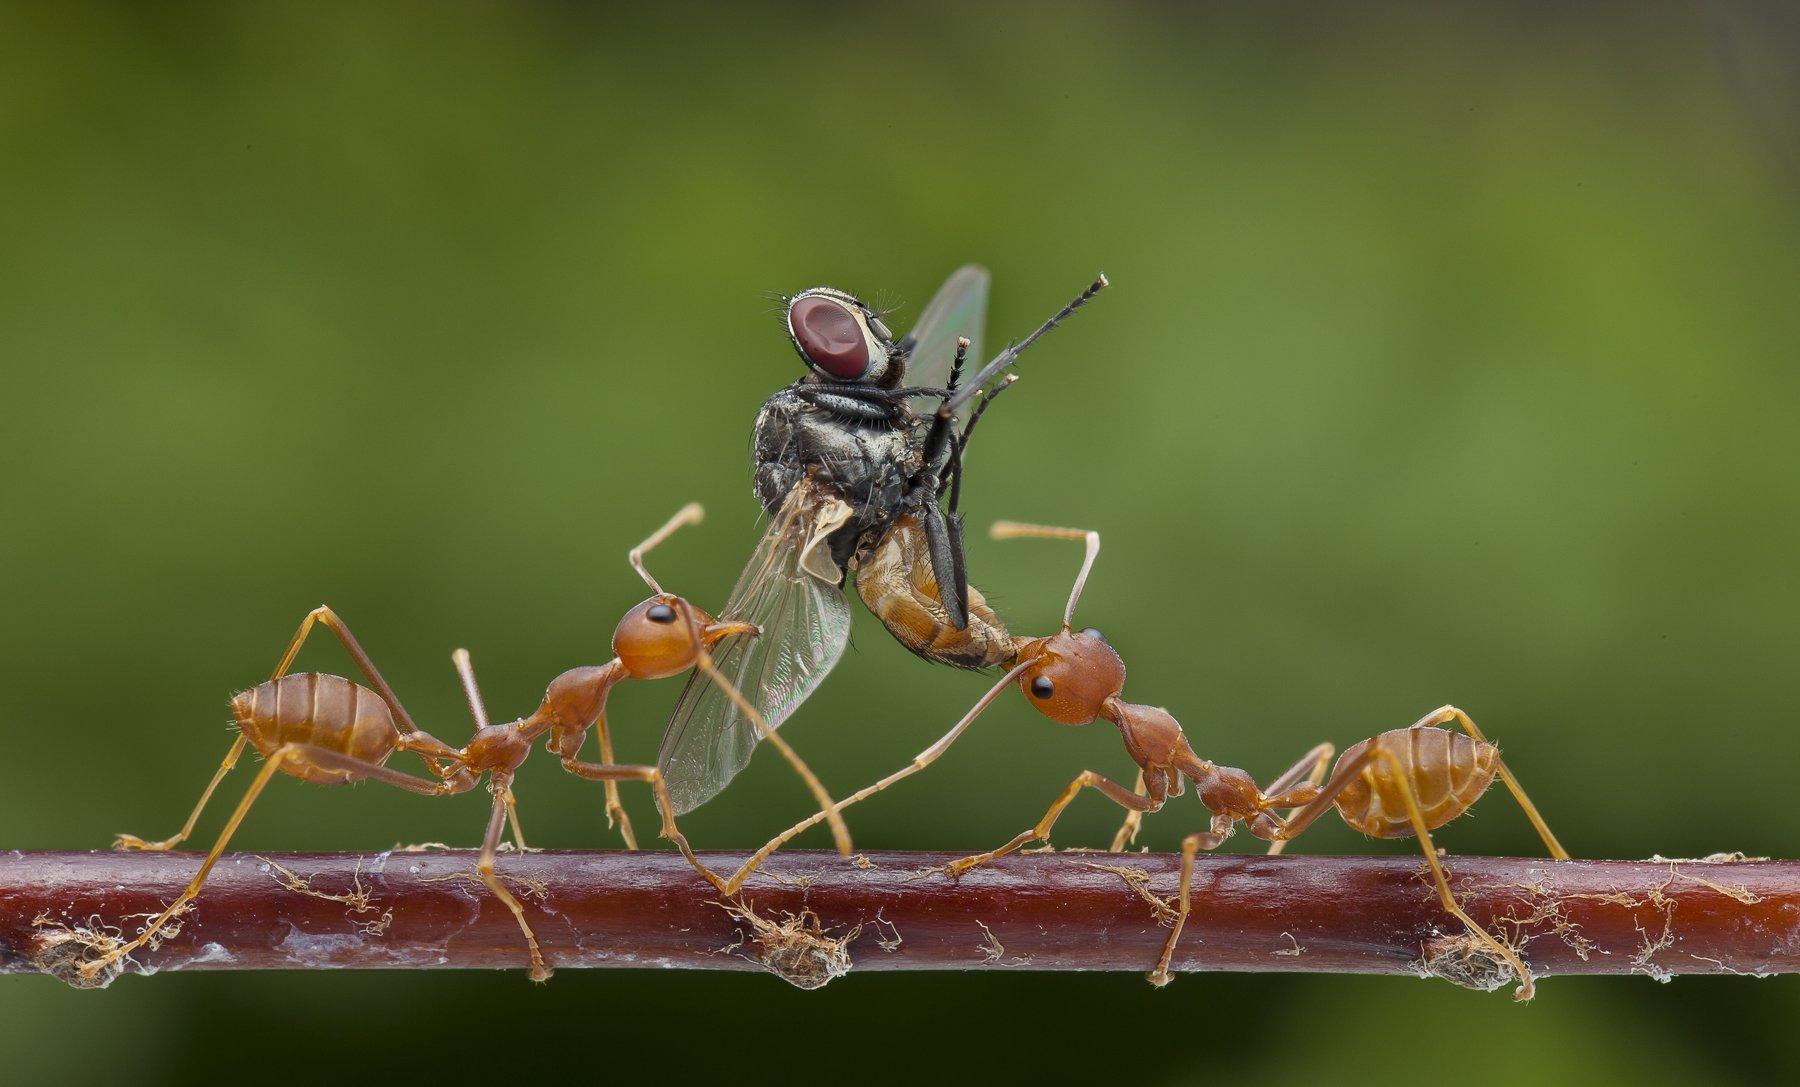 #macro#ant#fly#calors, Lim Choo How